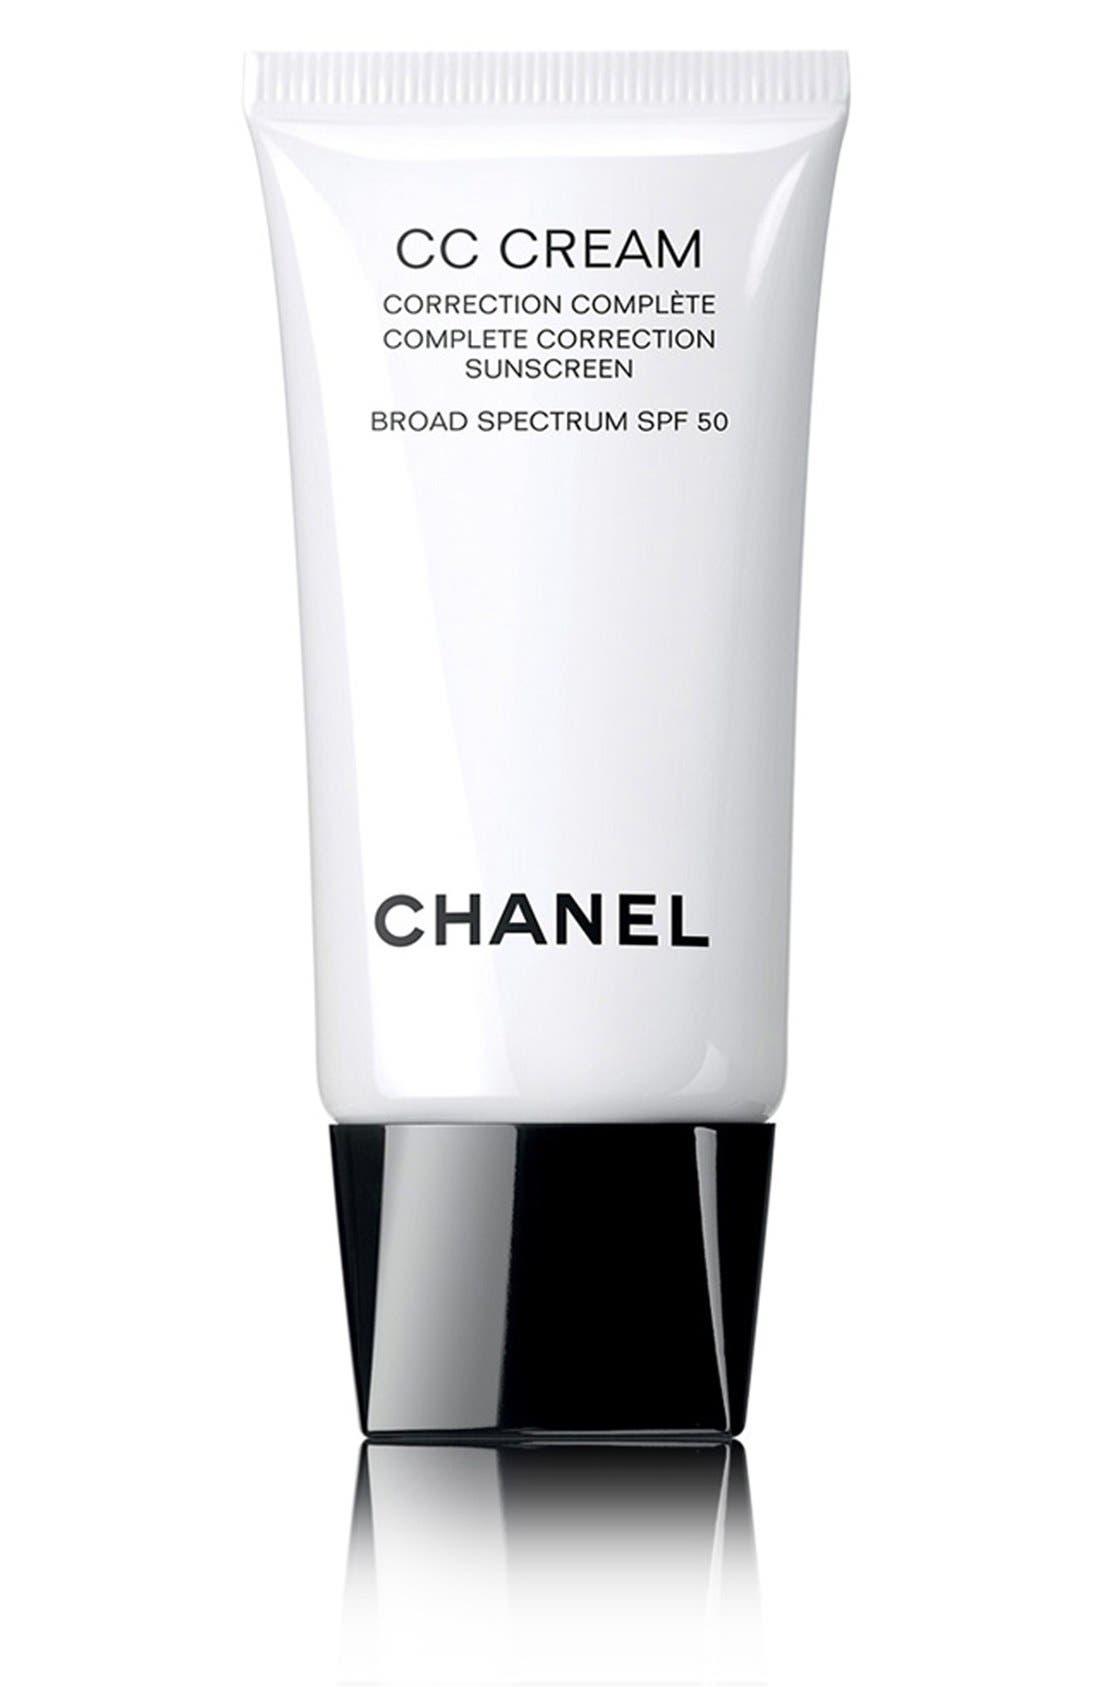 CC CREAM<br />Complete Correction Sunscreen Broad Spectrum SPF 50,                         Main,                         color,